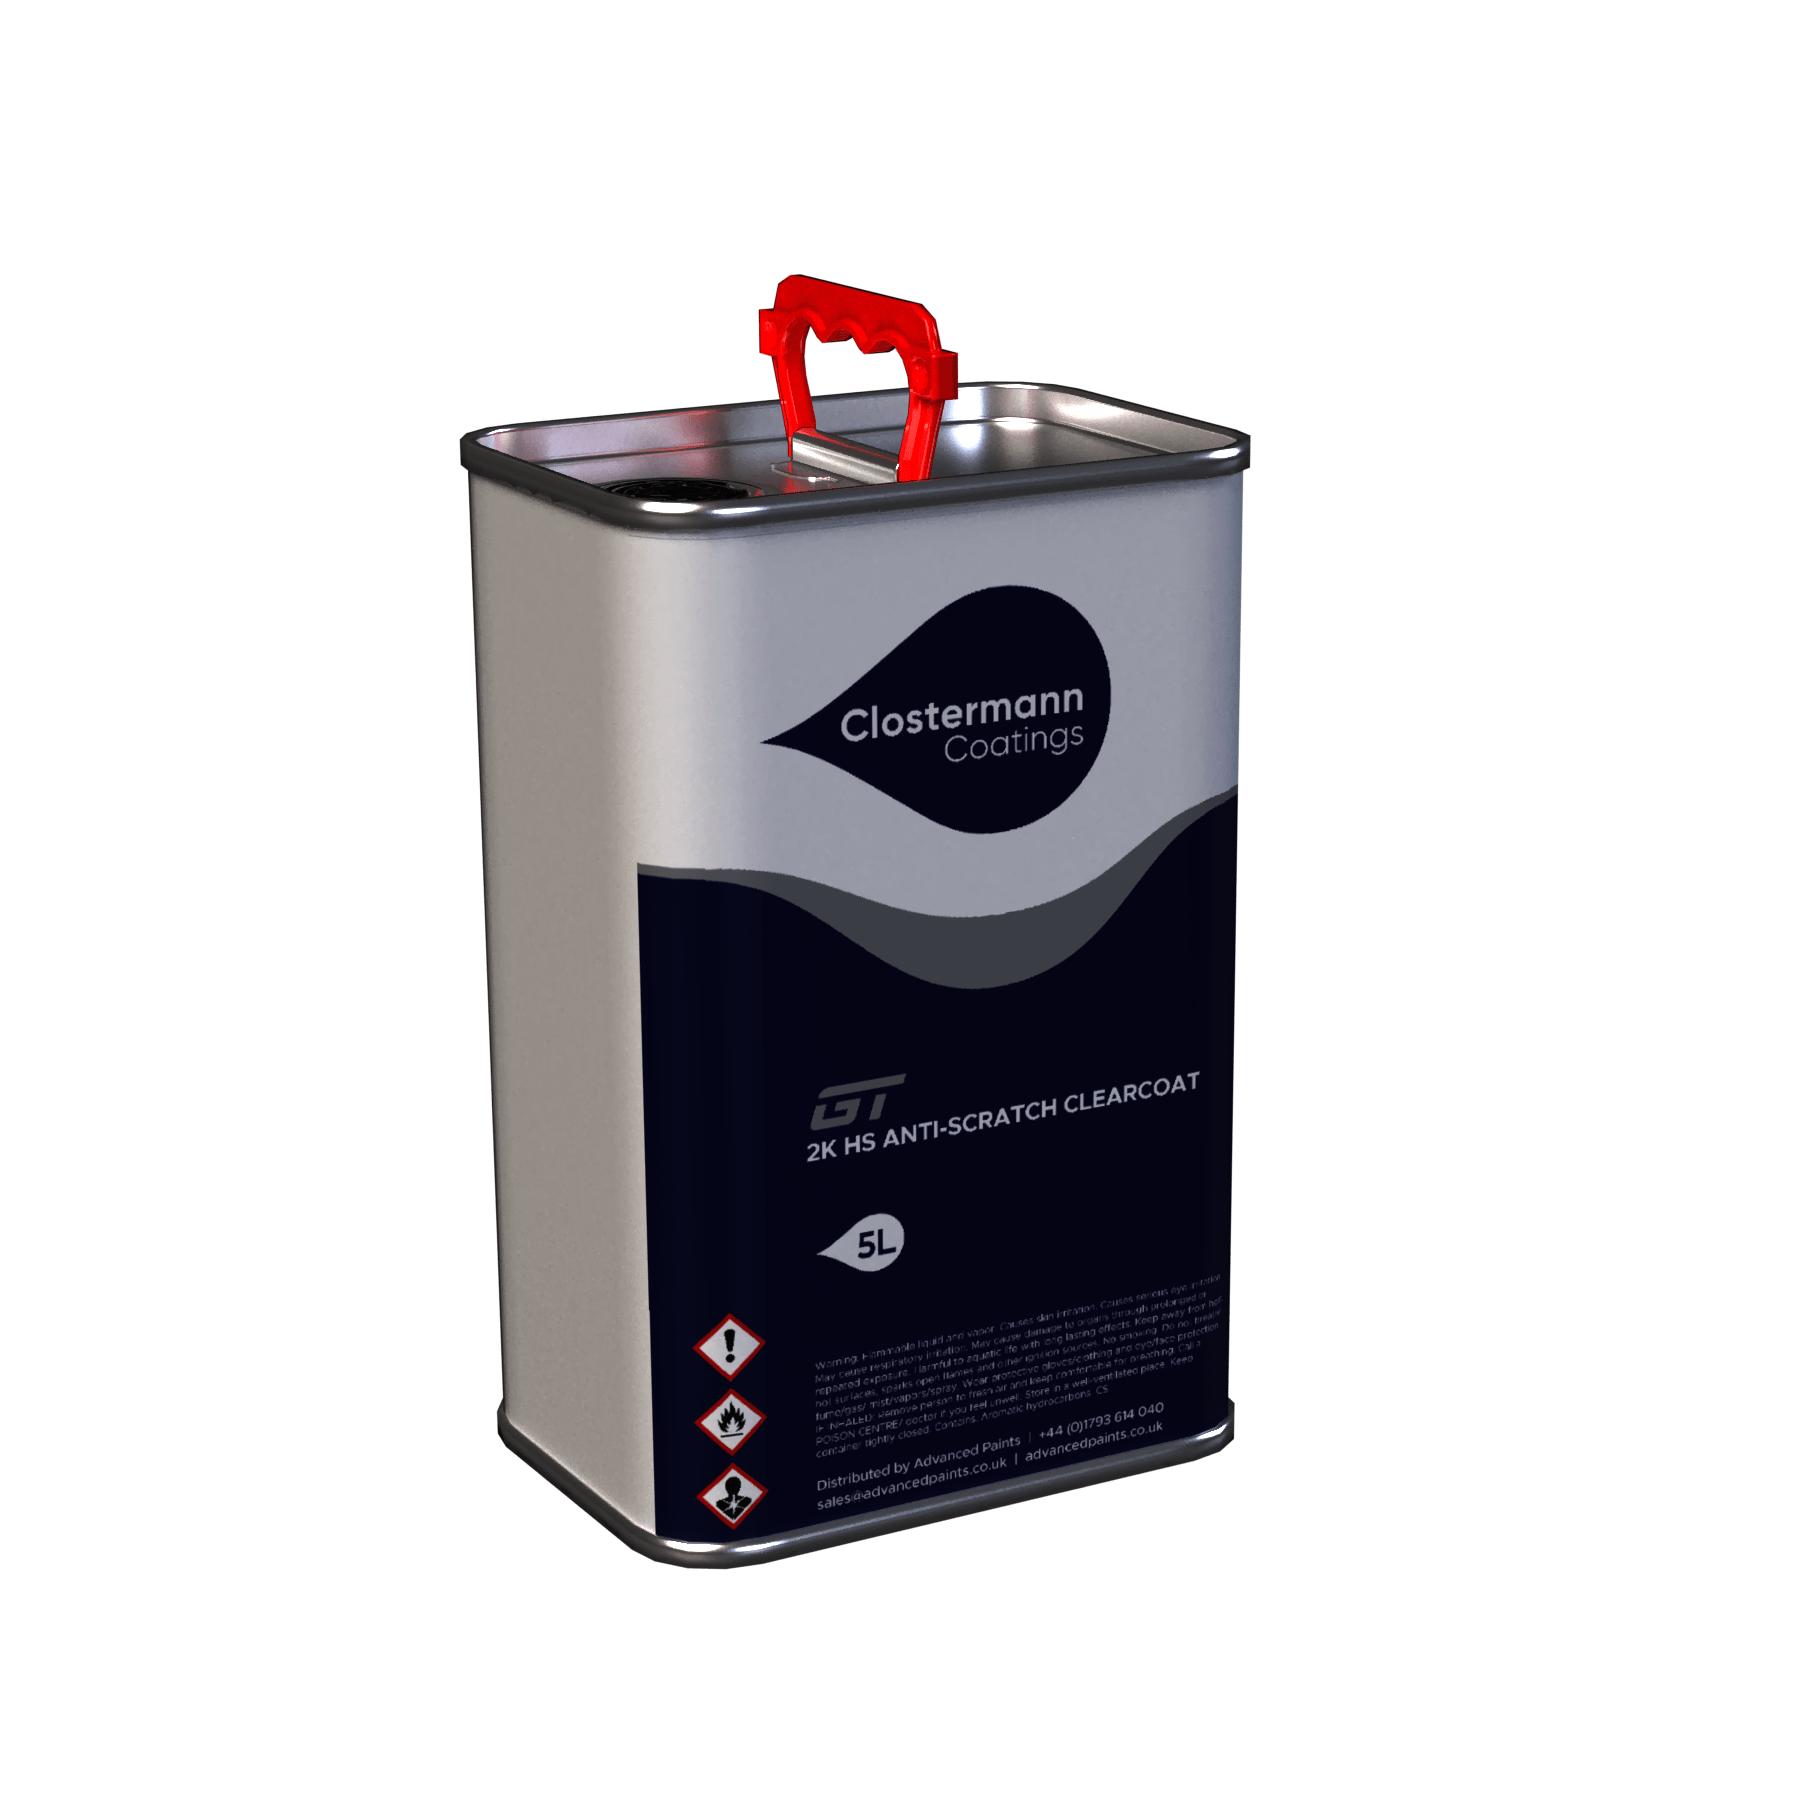 Clostermann GT 2K HS Clearcoat[[CL20HSC Clearcoat]]